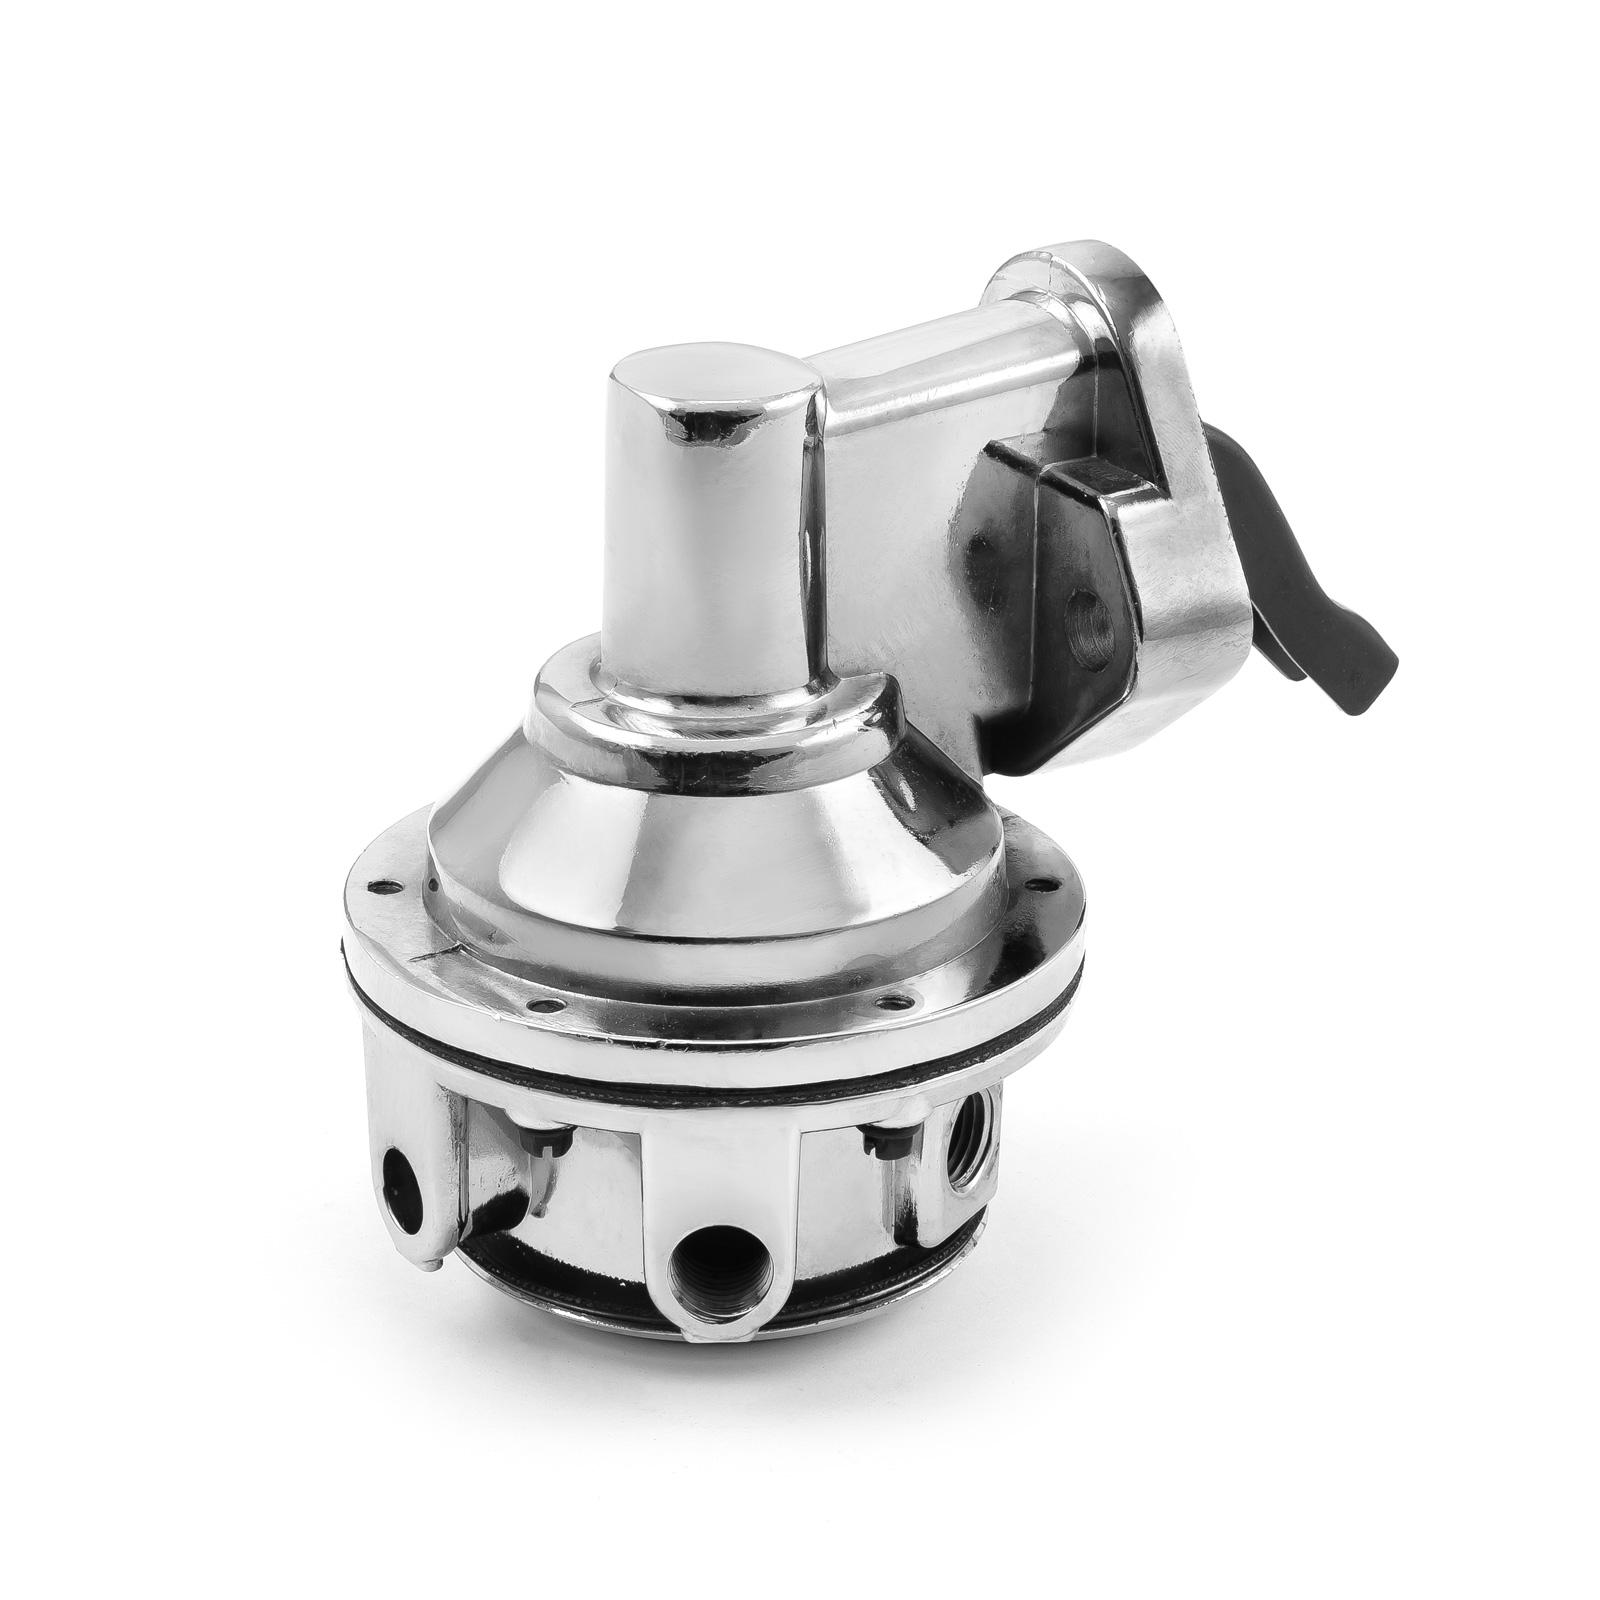 "Chevy BBC 454 High Volume Mechanical Fuel Pump Chrome 3/8"" NPT Fitting"